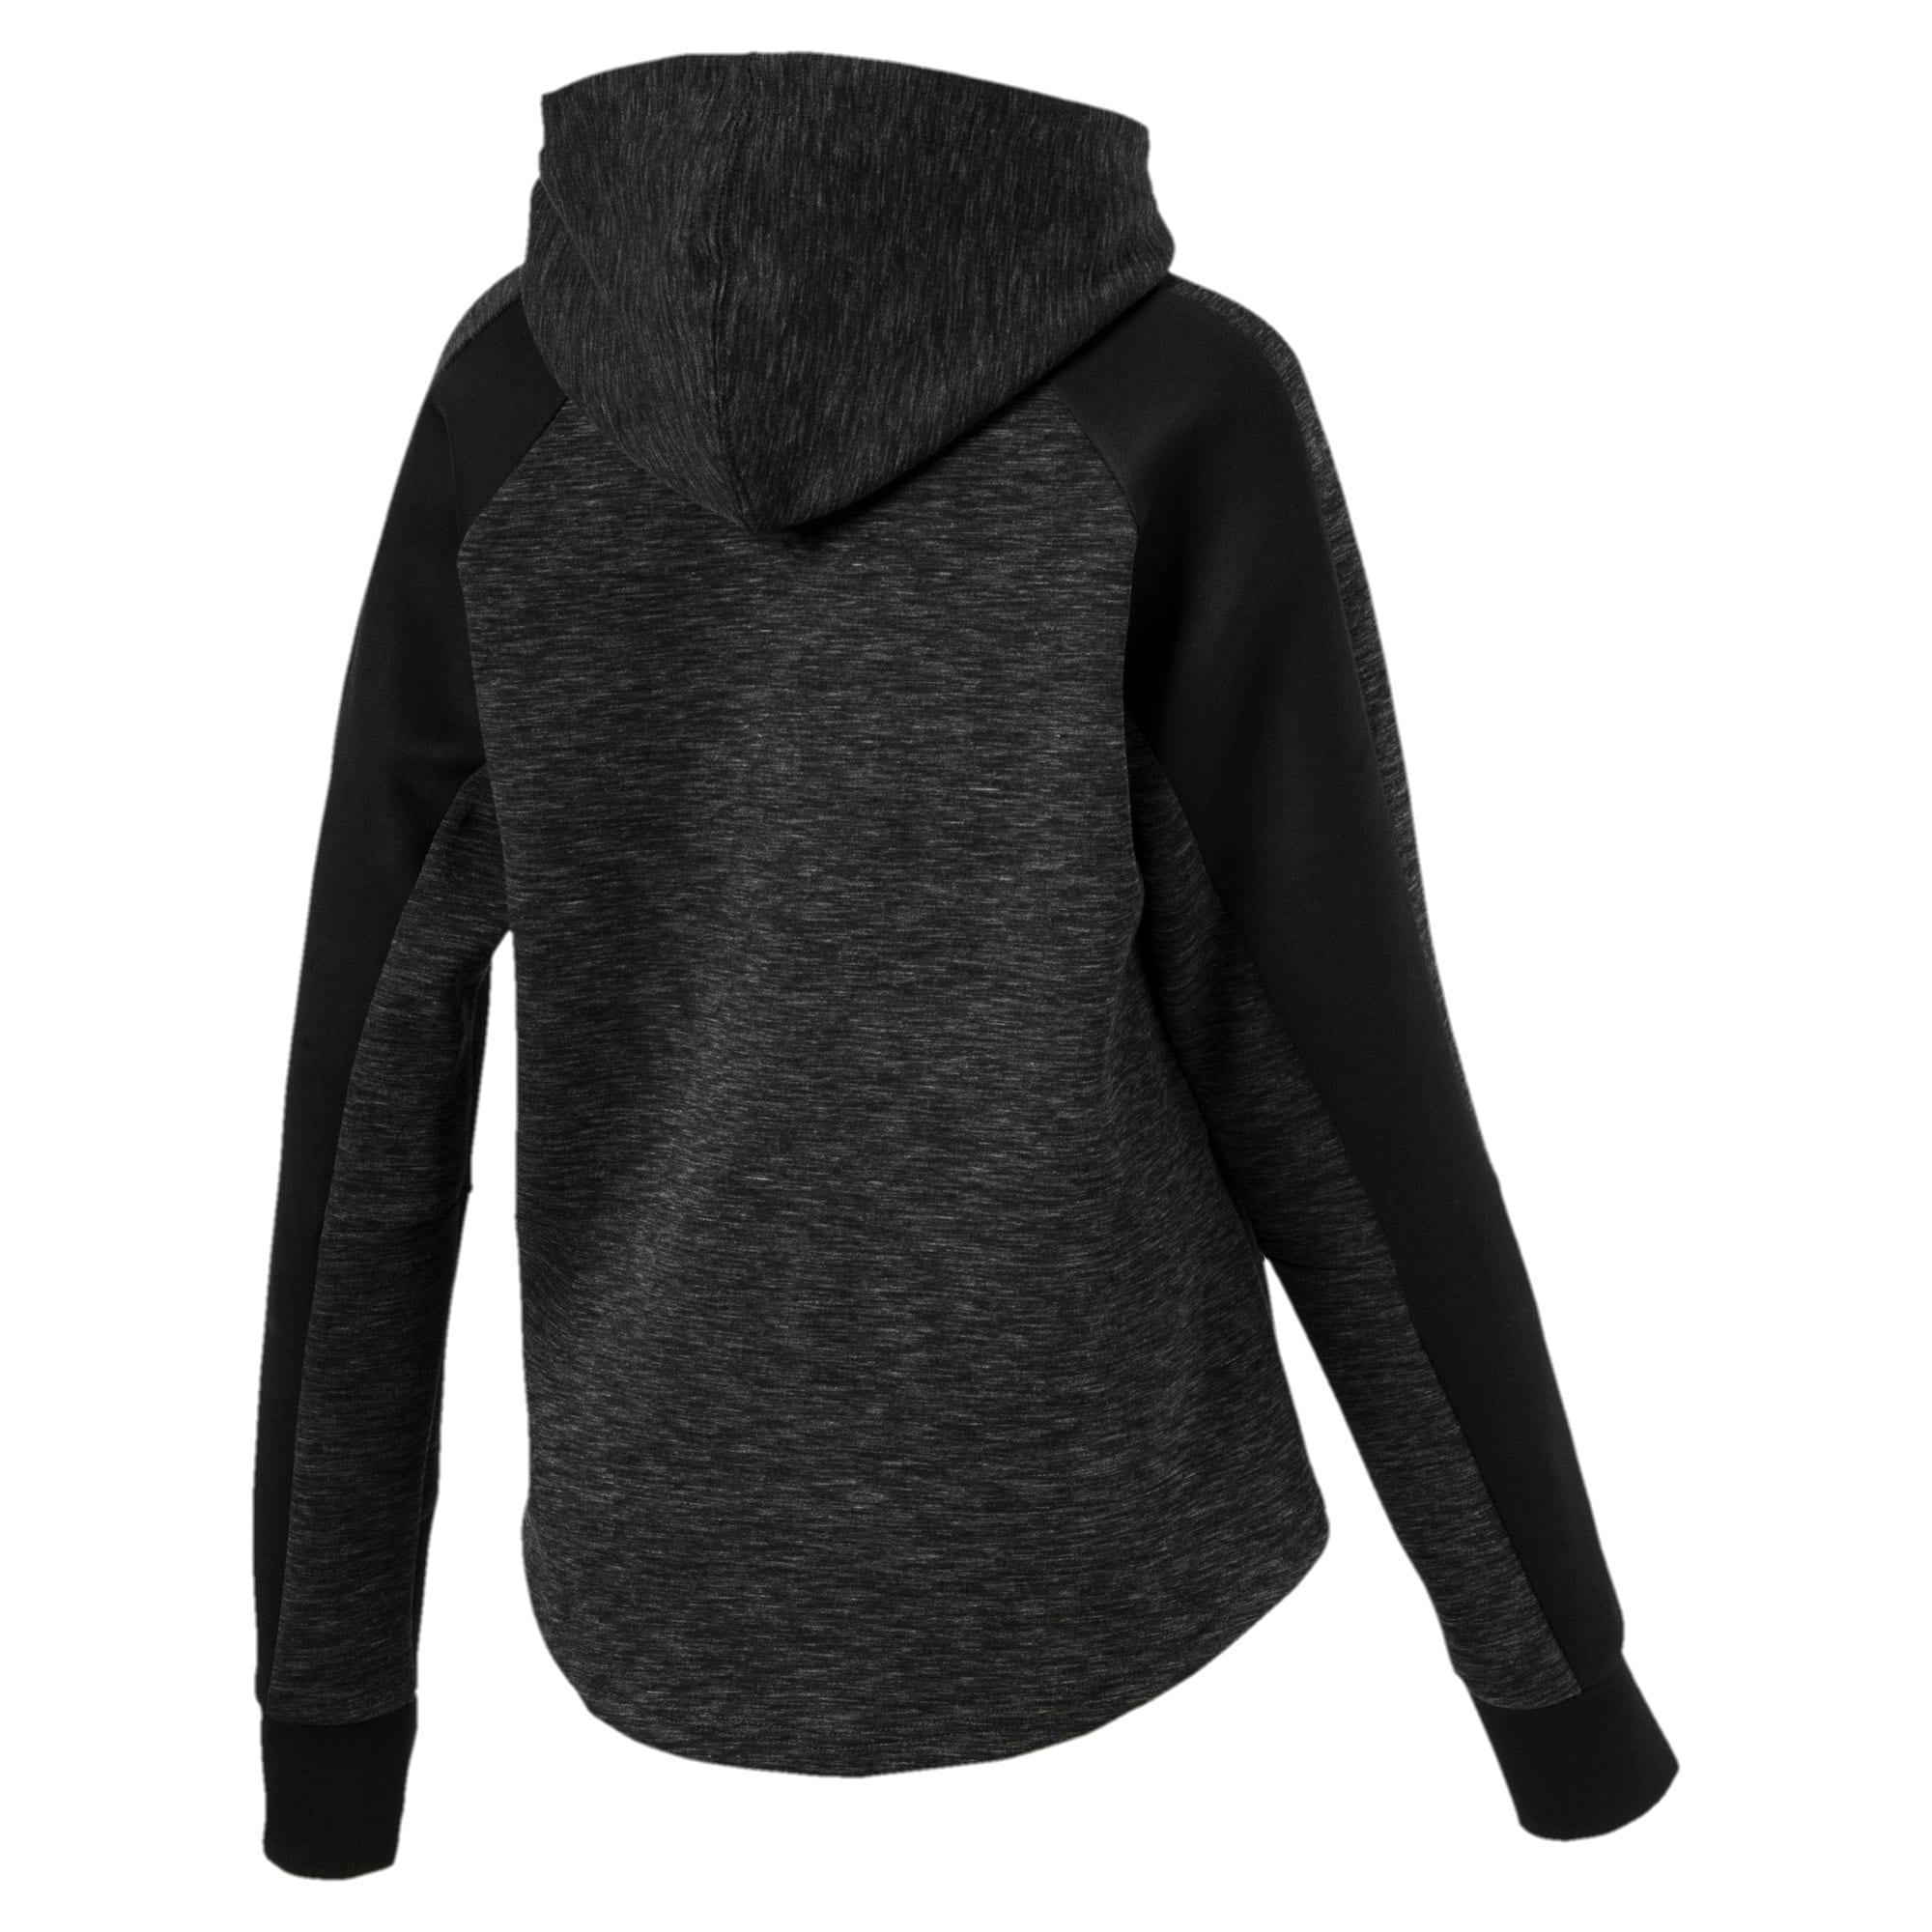 Thumbnail 4 of Evostripe hoodie met rits voor dames, Cotton Black-heather, medium